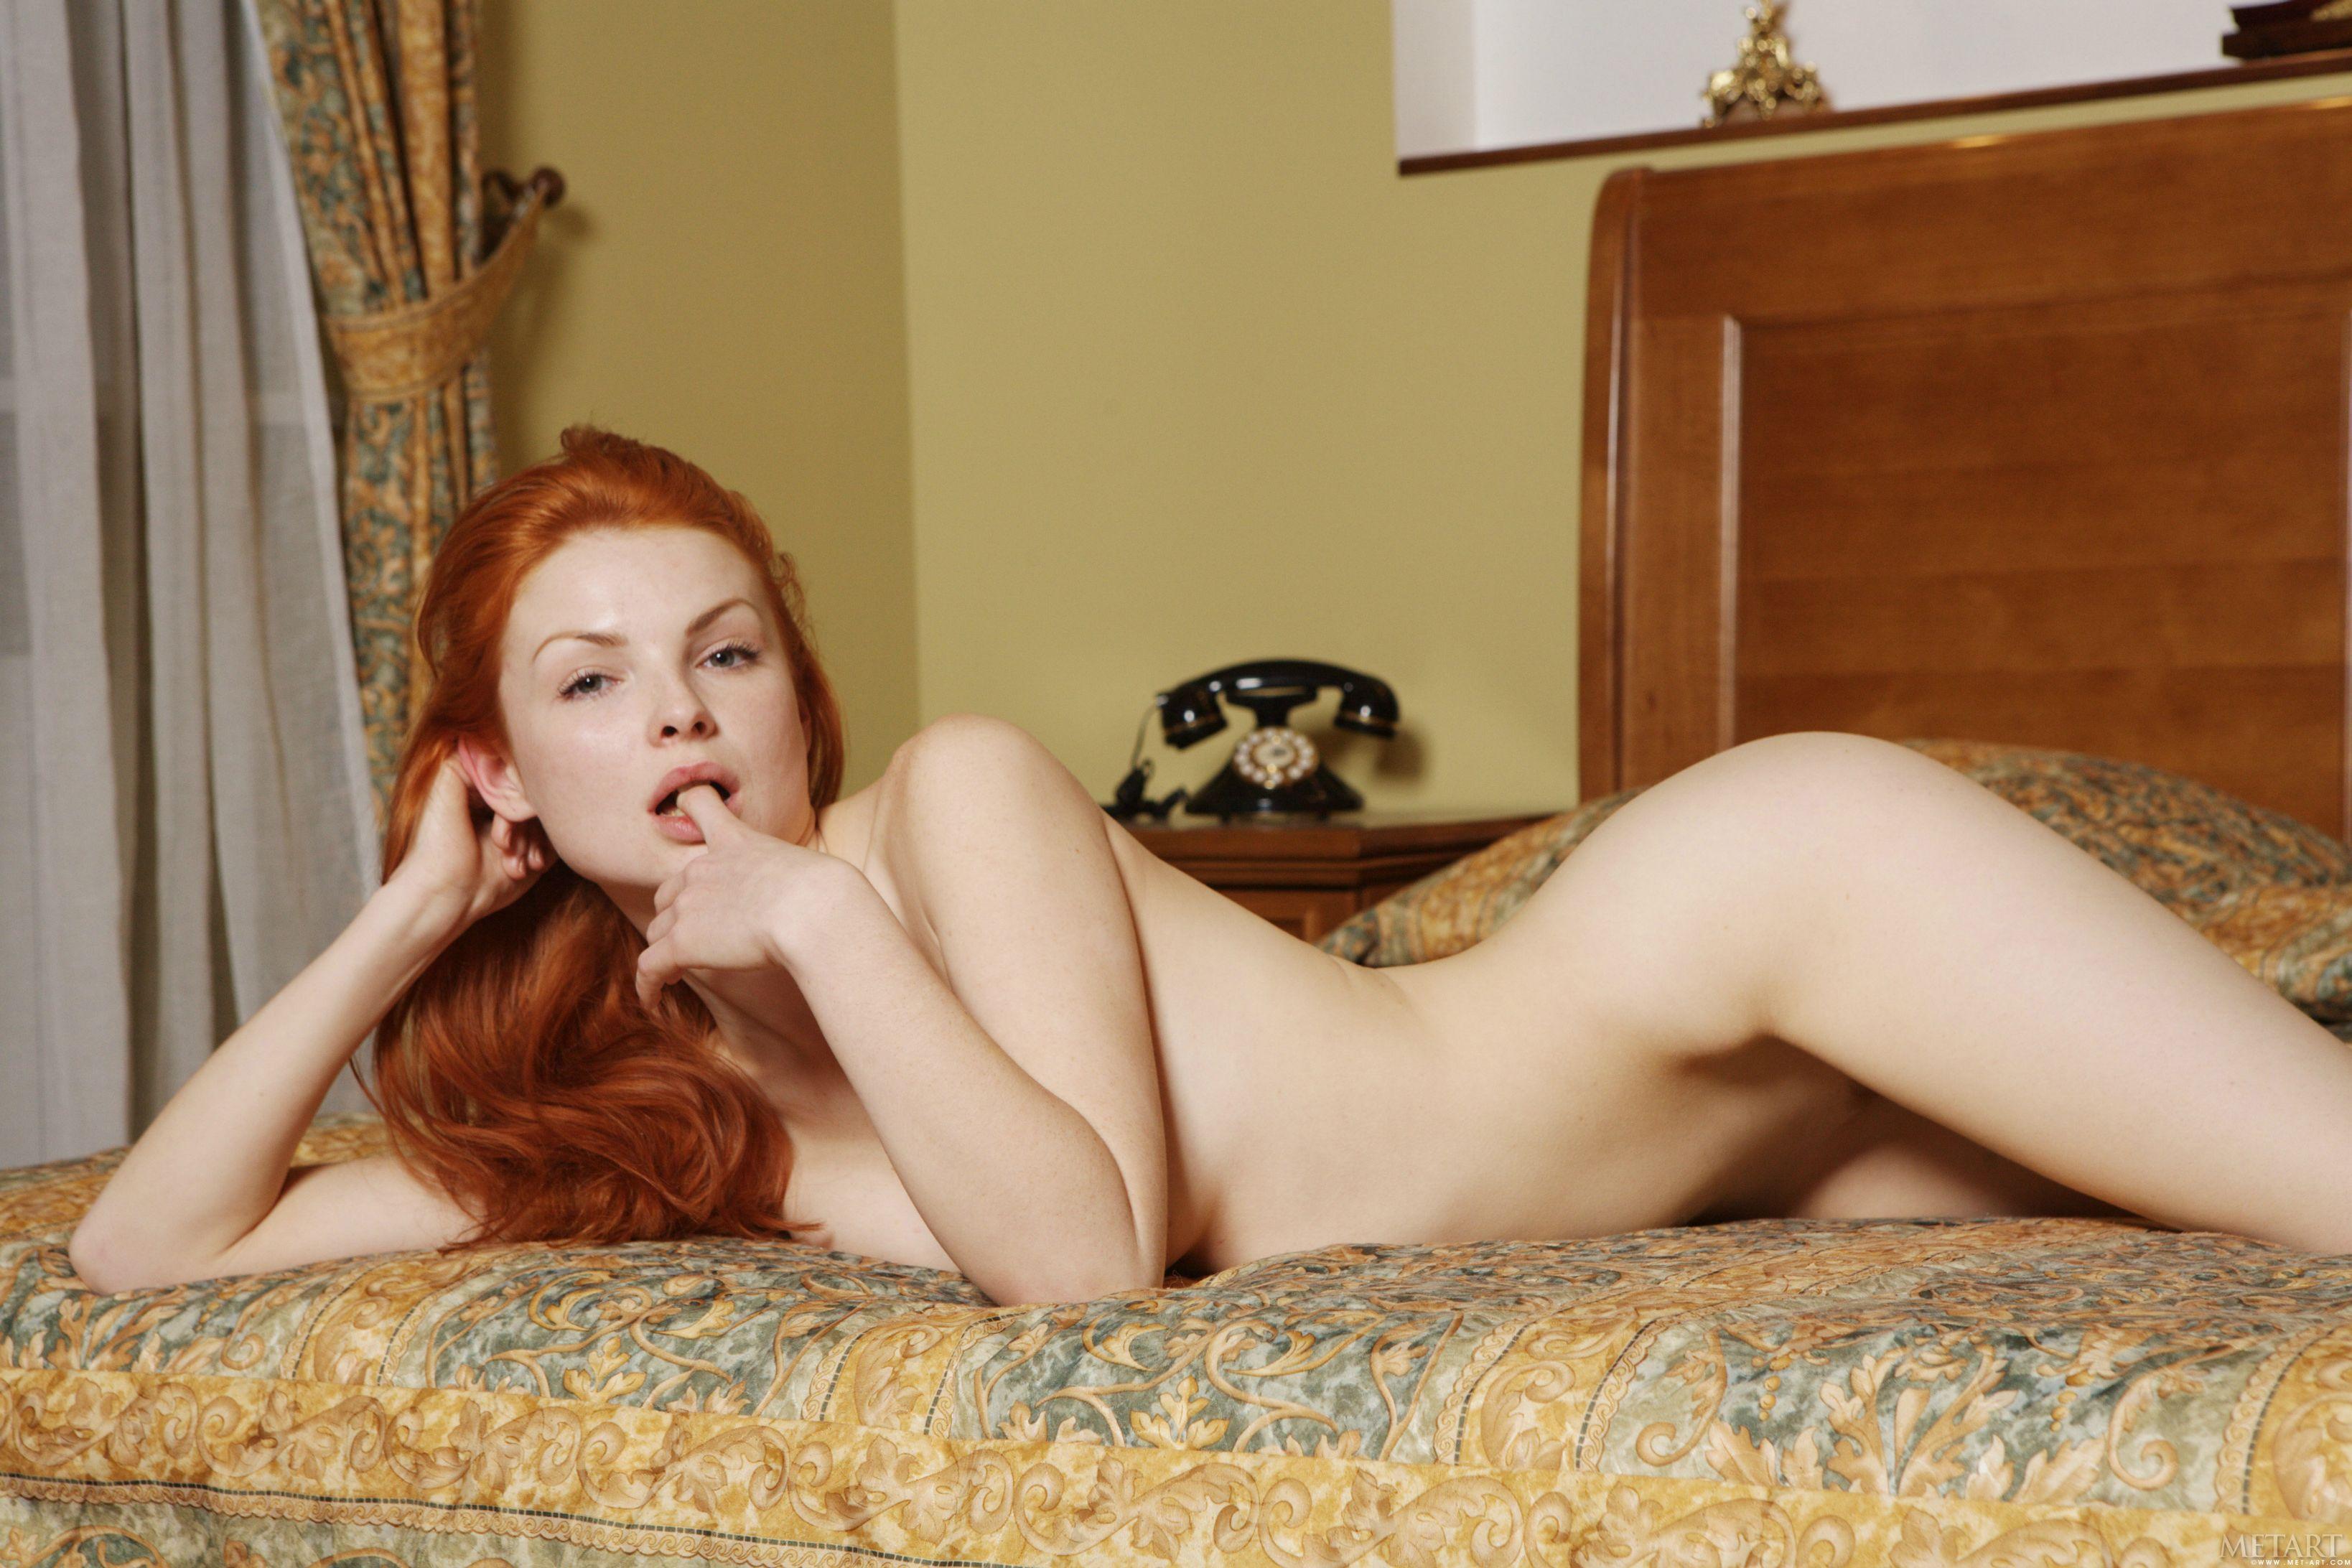 Anna erotica sapphic